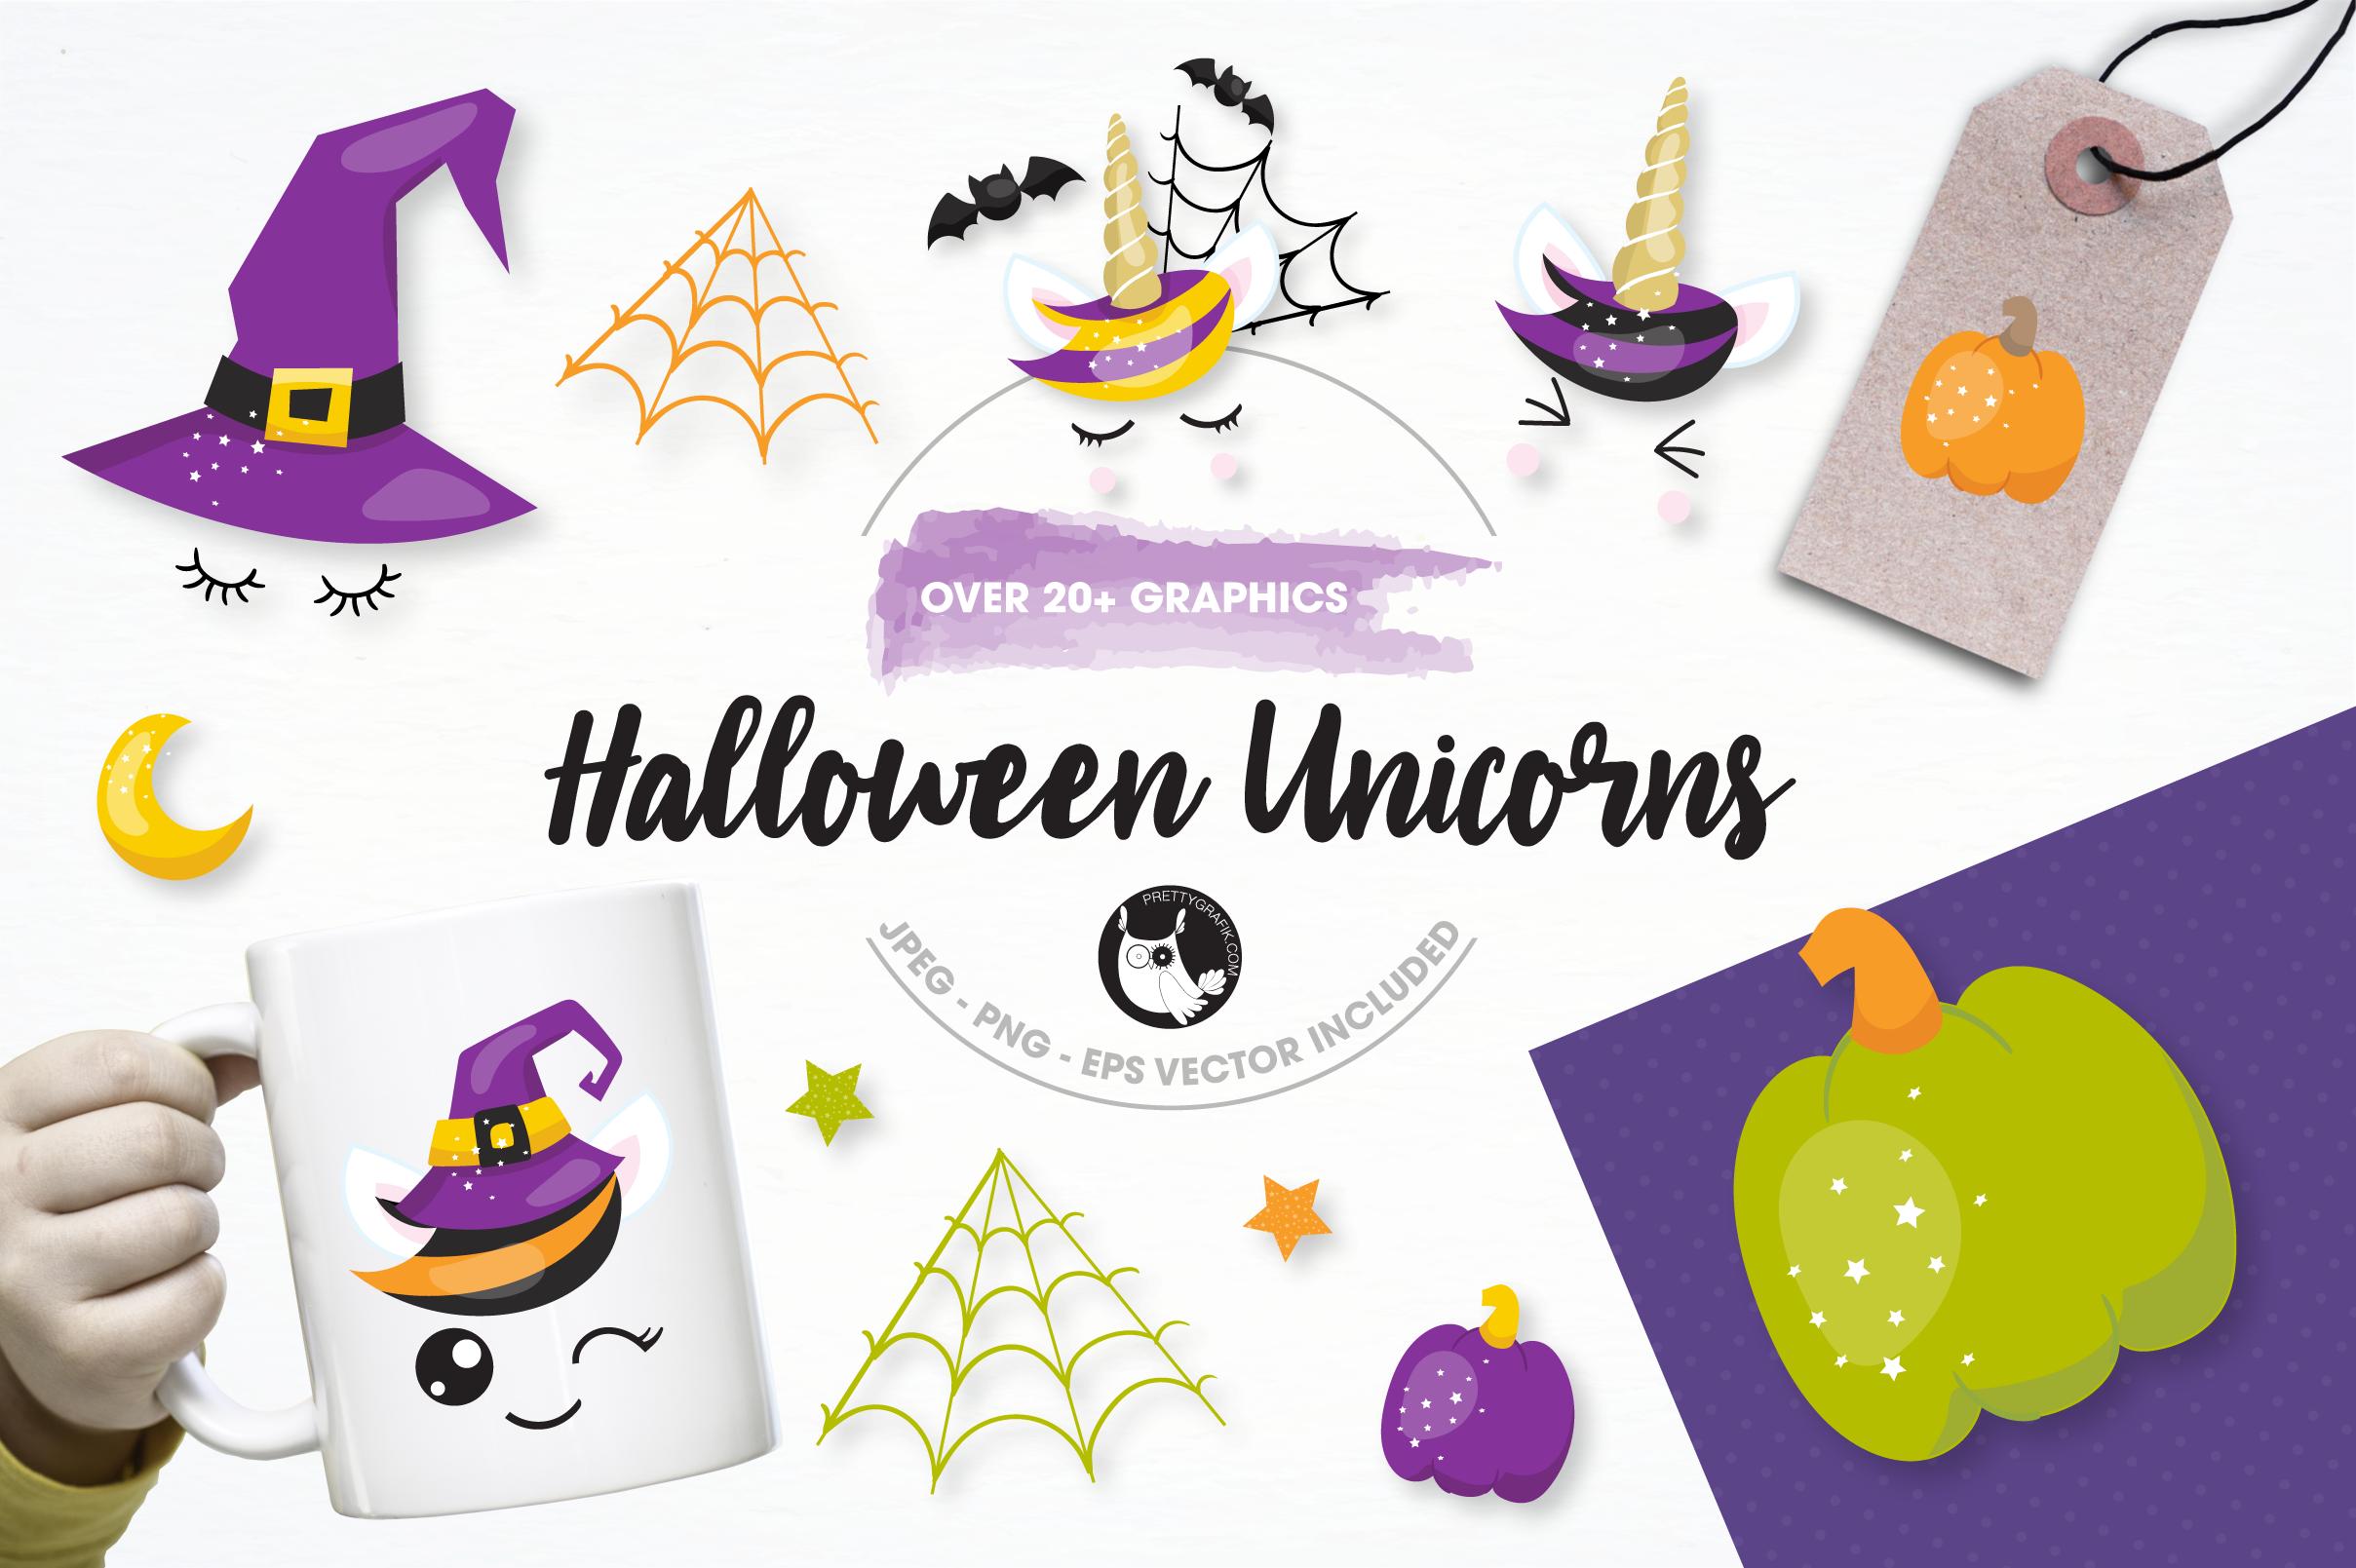 Halloween unicorns graphics and illustrations example image 1